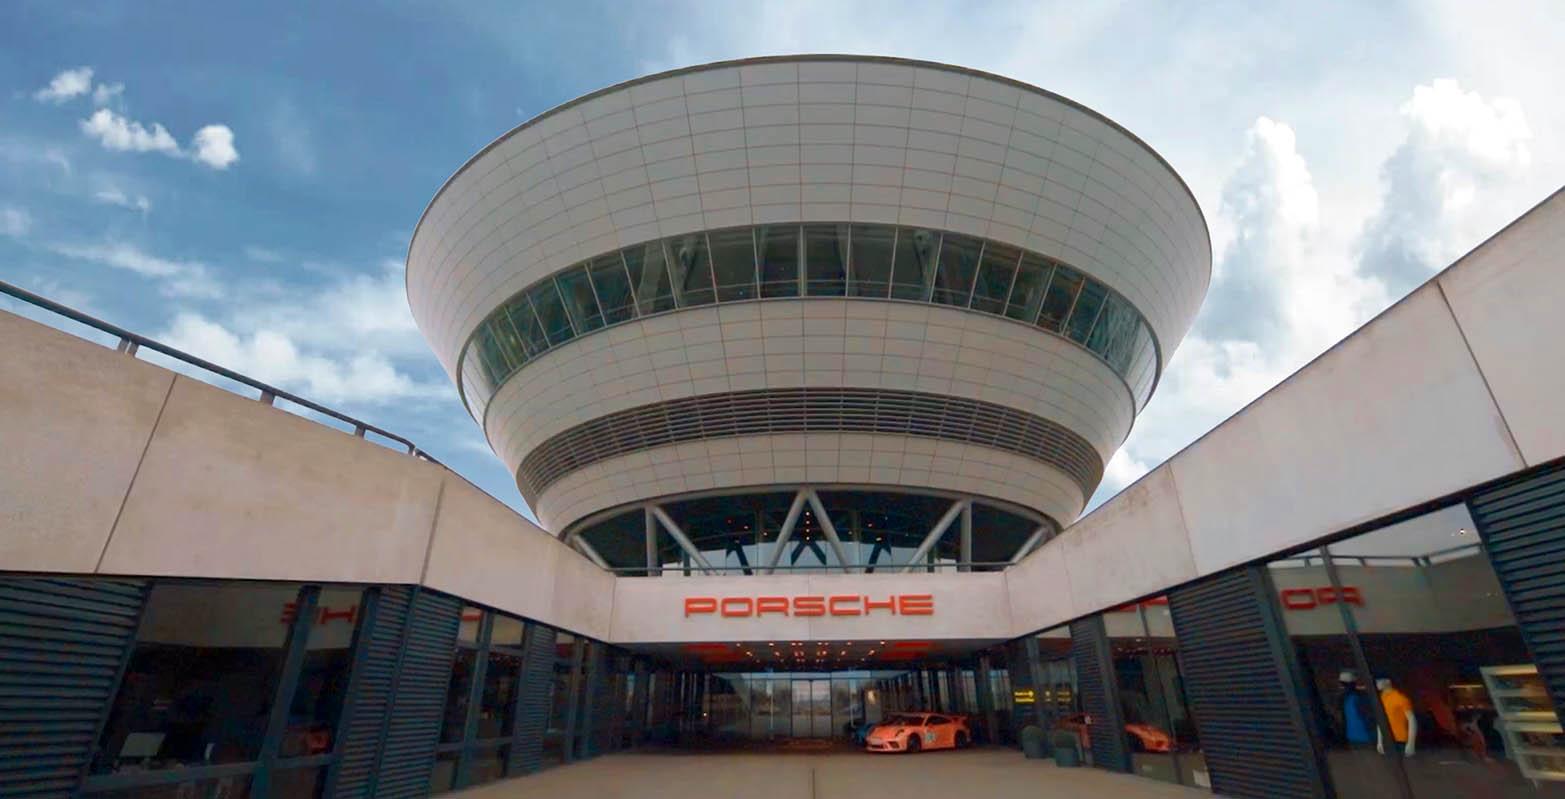 Porsche Center Leipzicht Germany Sterck magazines met Jason Berkley Studios